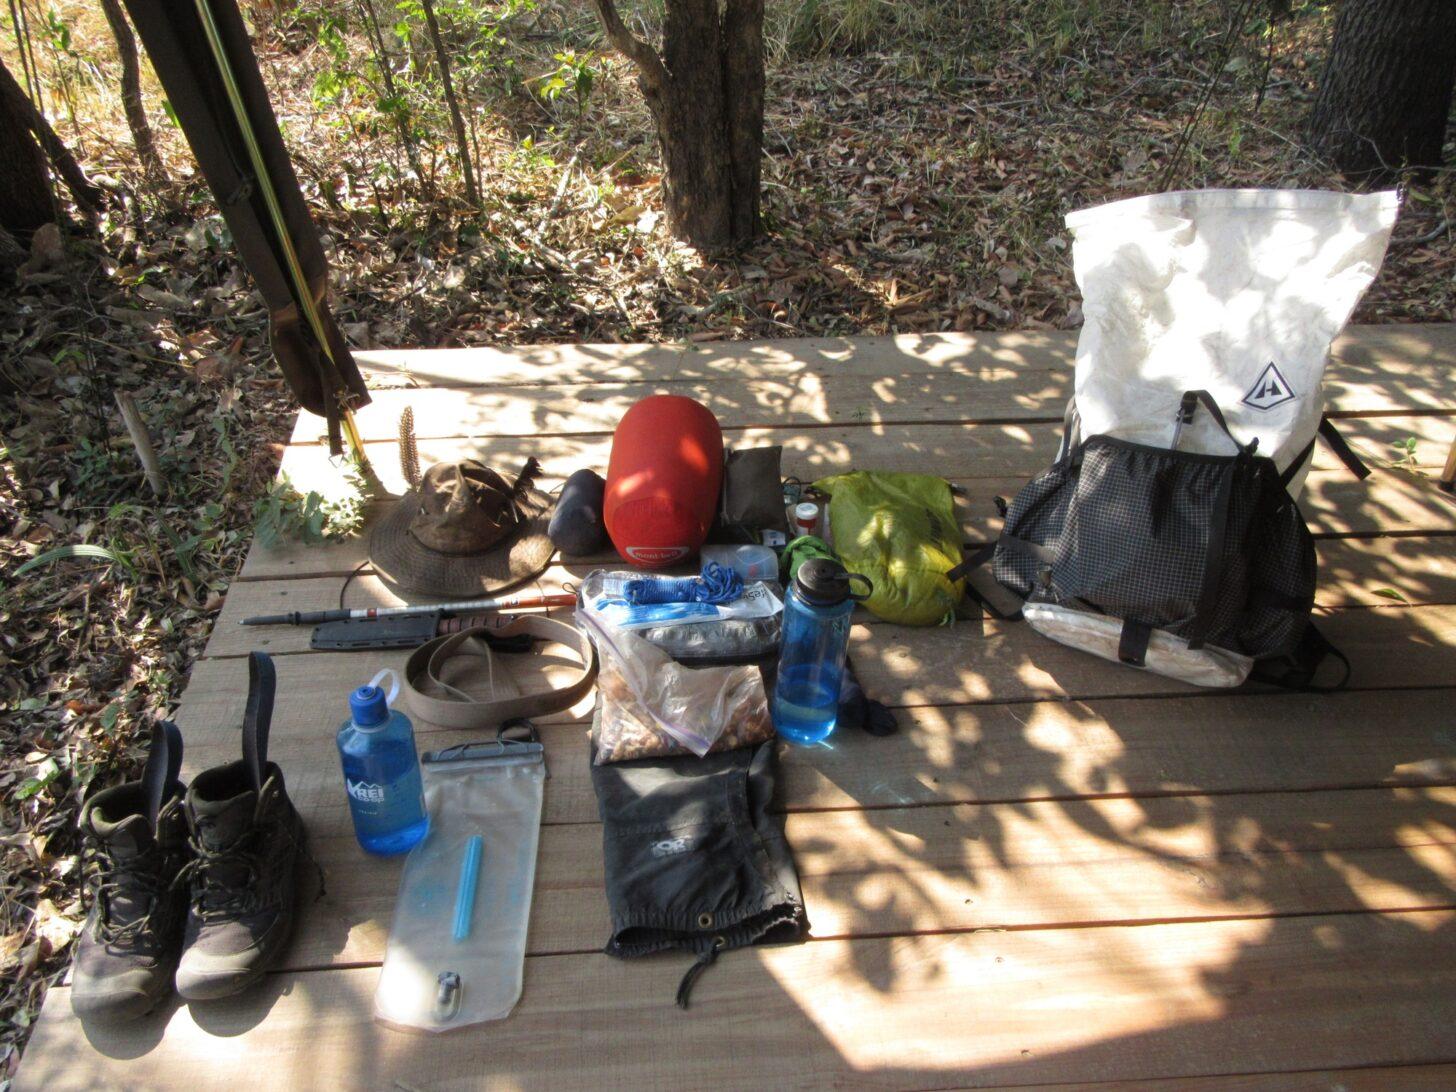 lightweight backpacking gear spread out across a wooden deck.